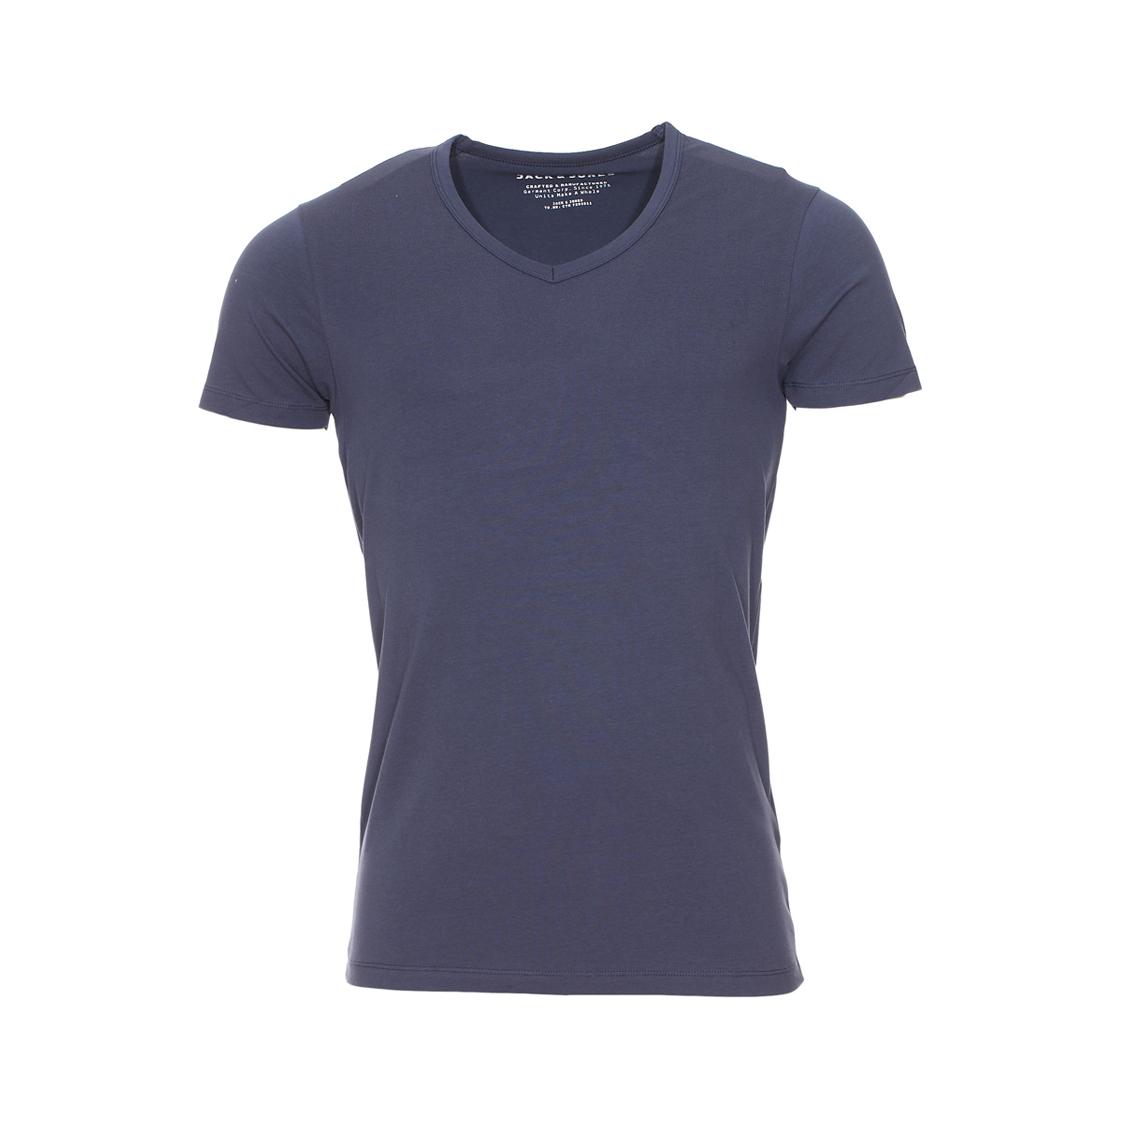 Tee-shirt col v jack&jones en coton stretch bleu marine